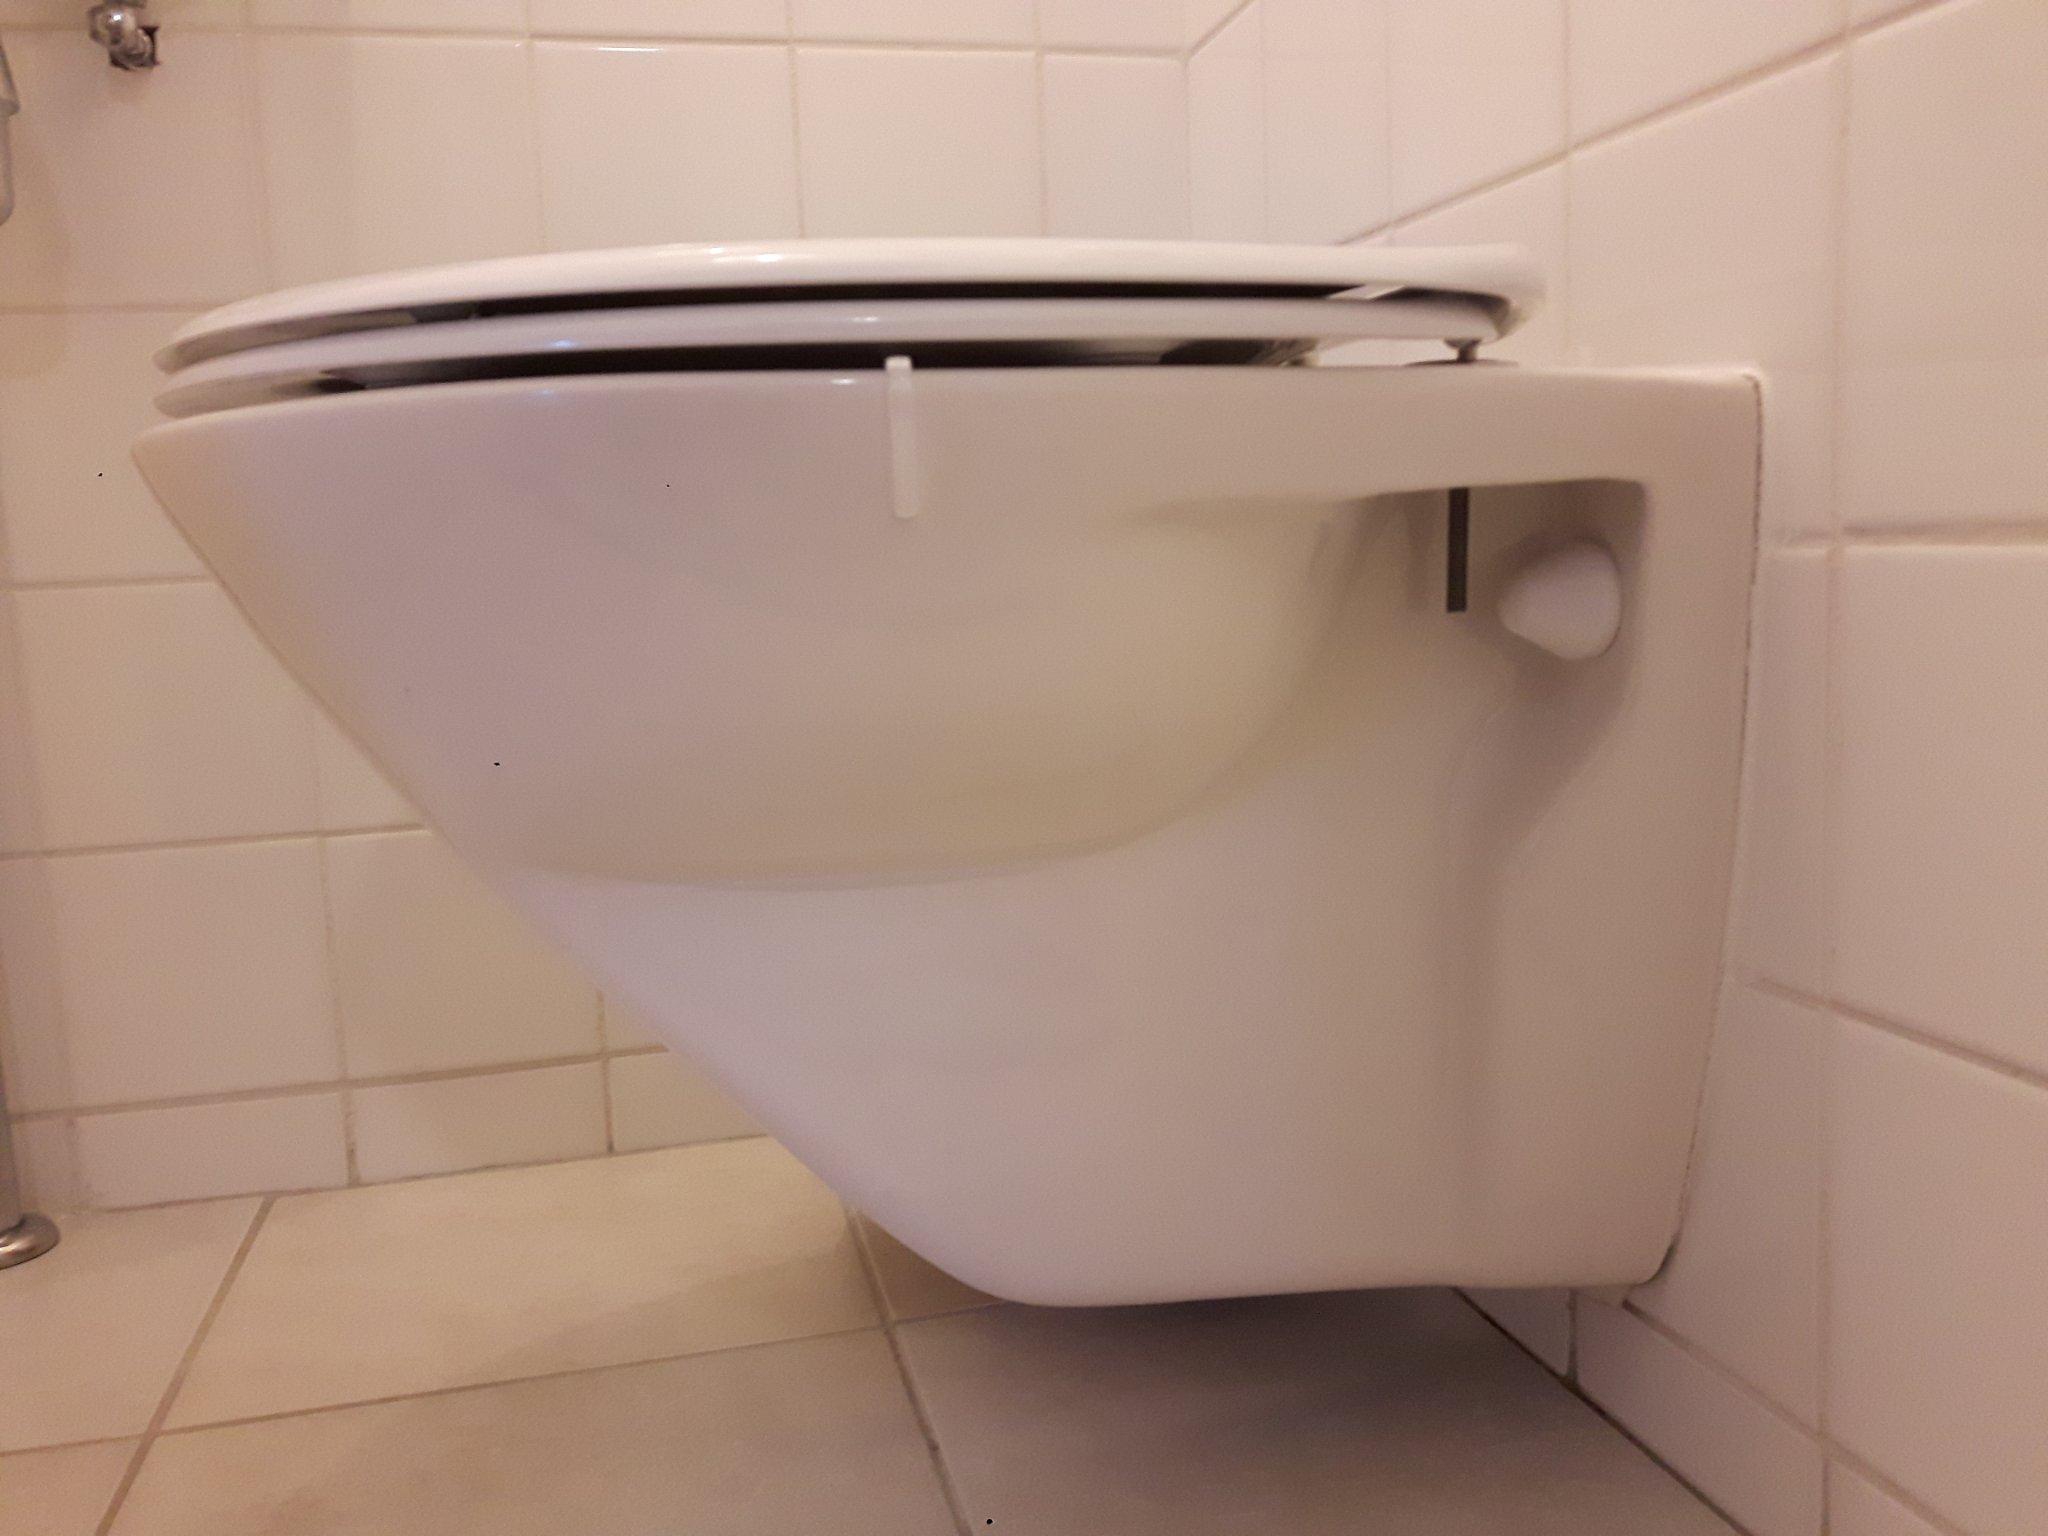 Bekend Hang Toilet lekt onderkant - Werkspot NE91